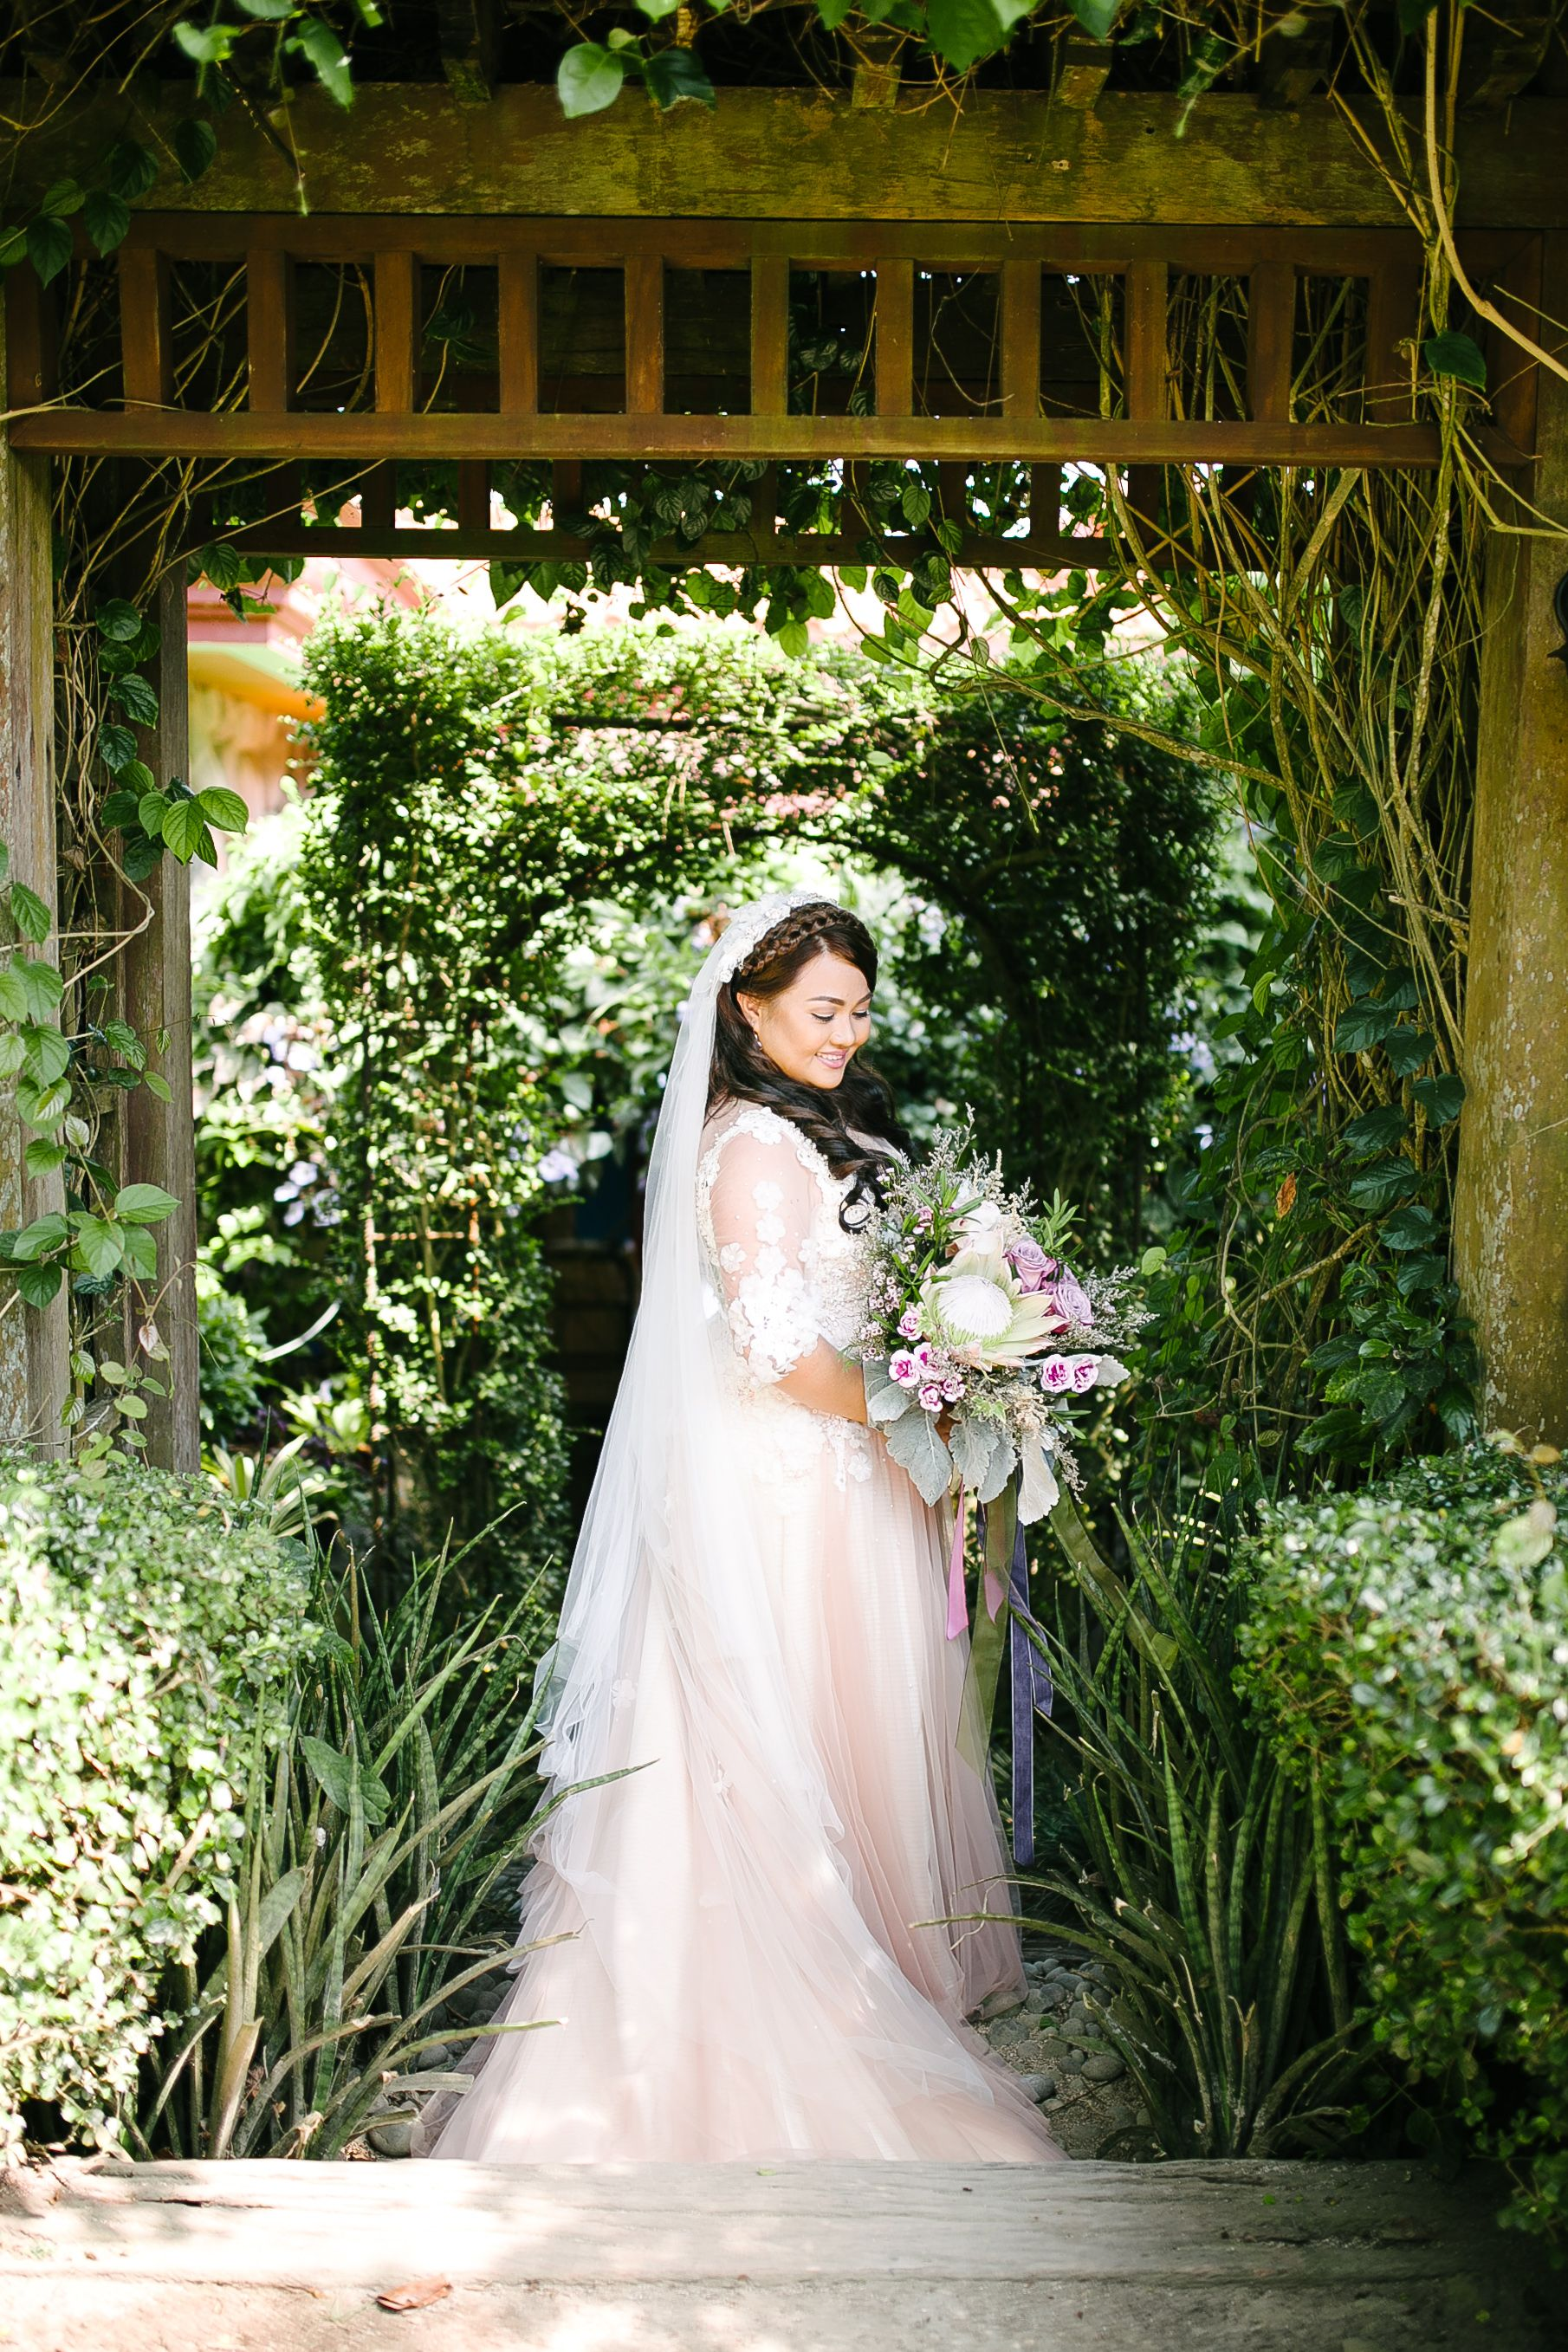 Blush Wedding Dress by Nino Angeles Philippines Fundacion Pacita ...